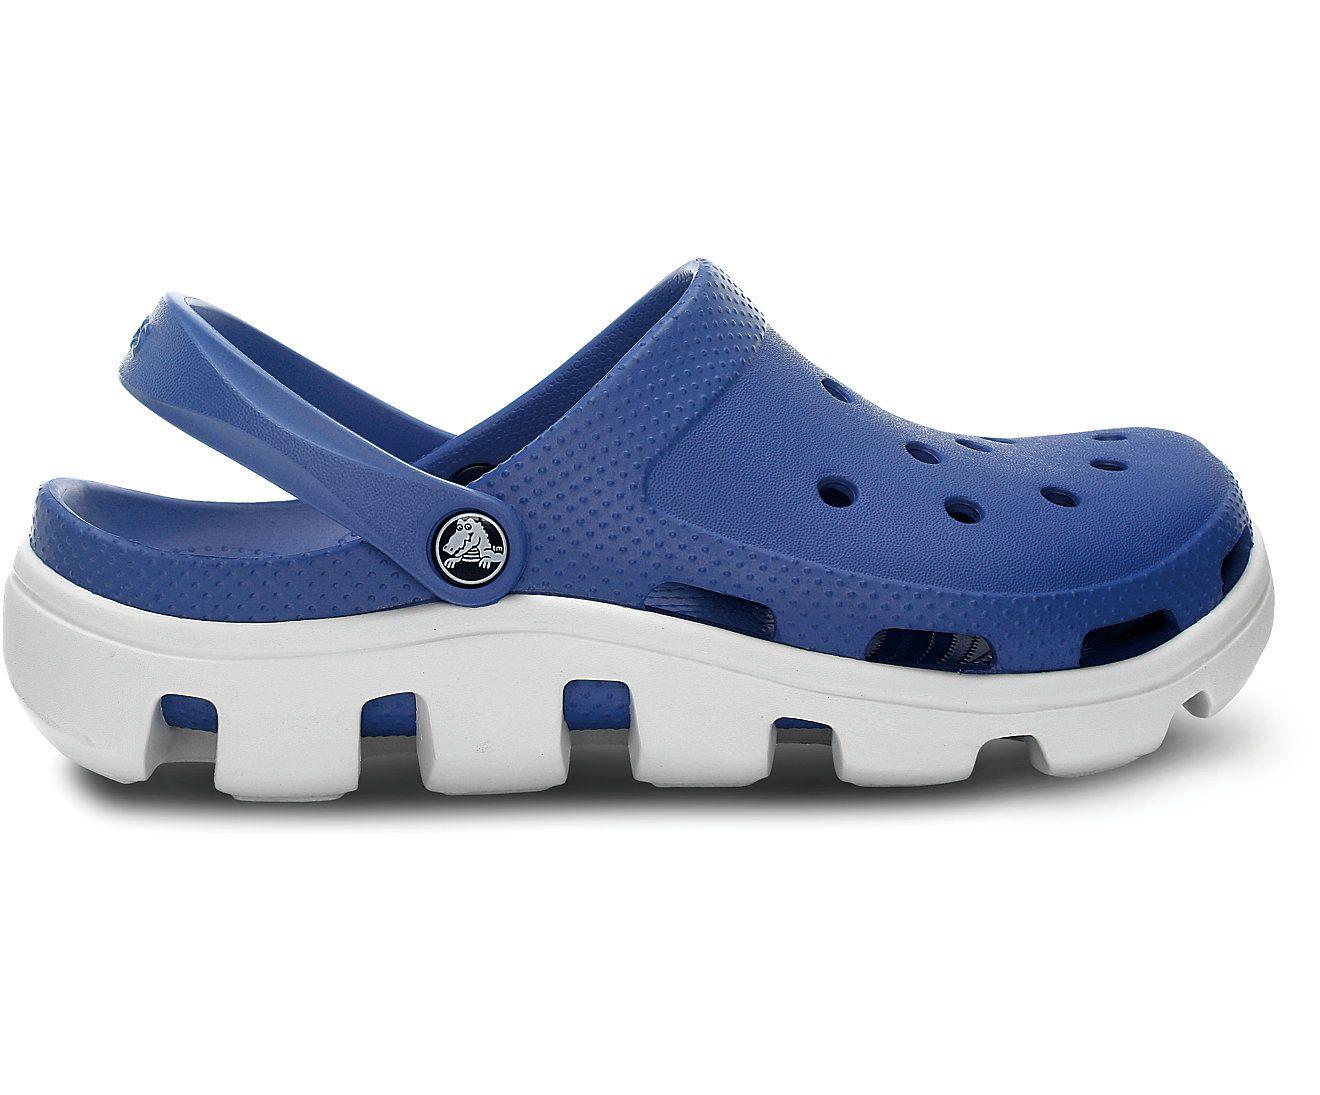 Comfortable Gardening Shoes Crocs™ Garden Shoes, Clogs